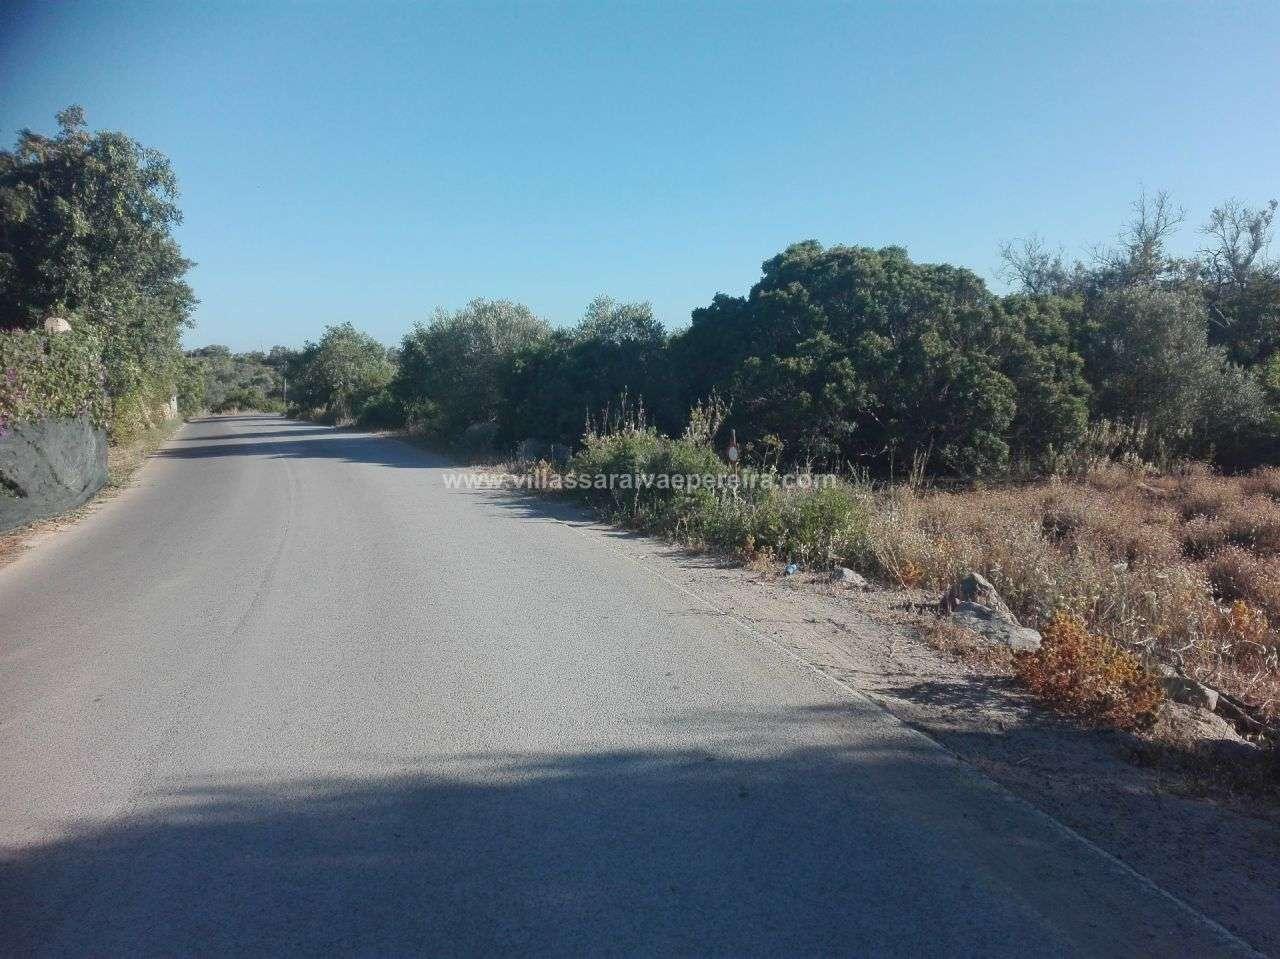 Terreno para comprar, Moncarapacho e Fuseta, Olhão, Faro - Foto 1